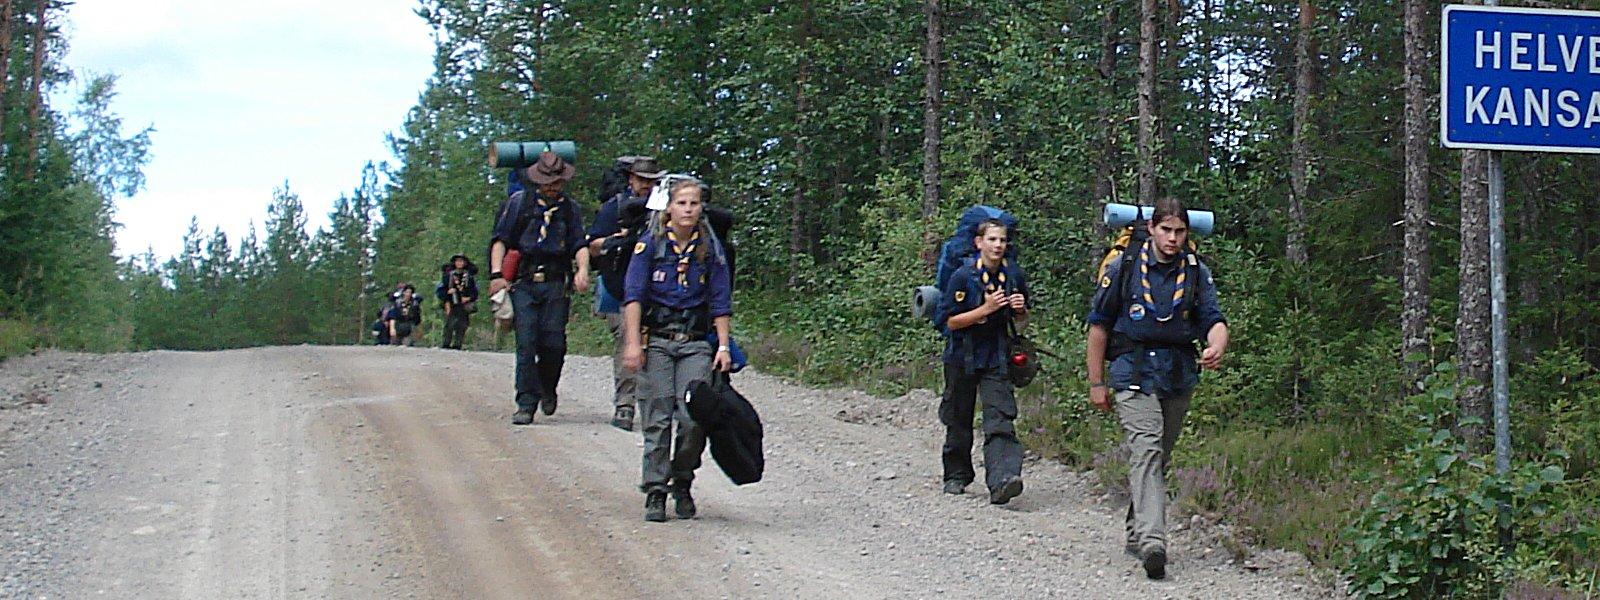 Unterwegs im Helvetinjärvi-Nationalpark (Finnland 2008)